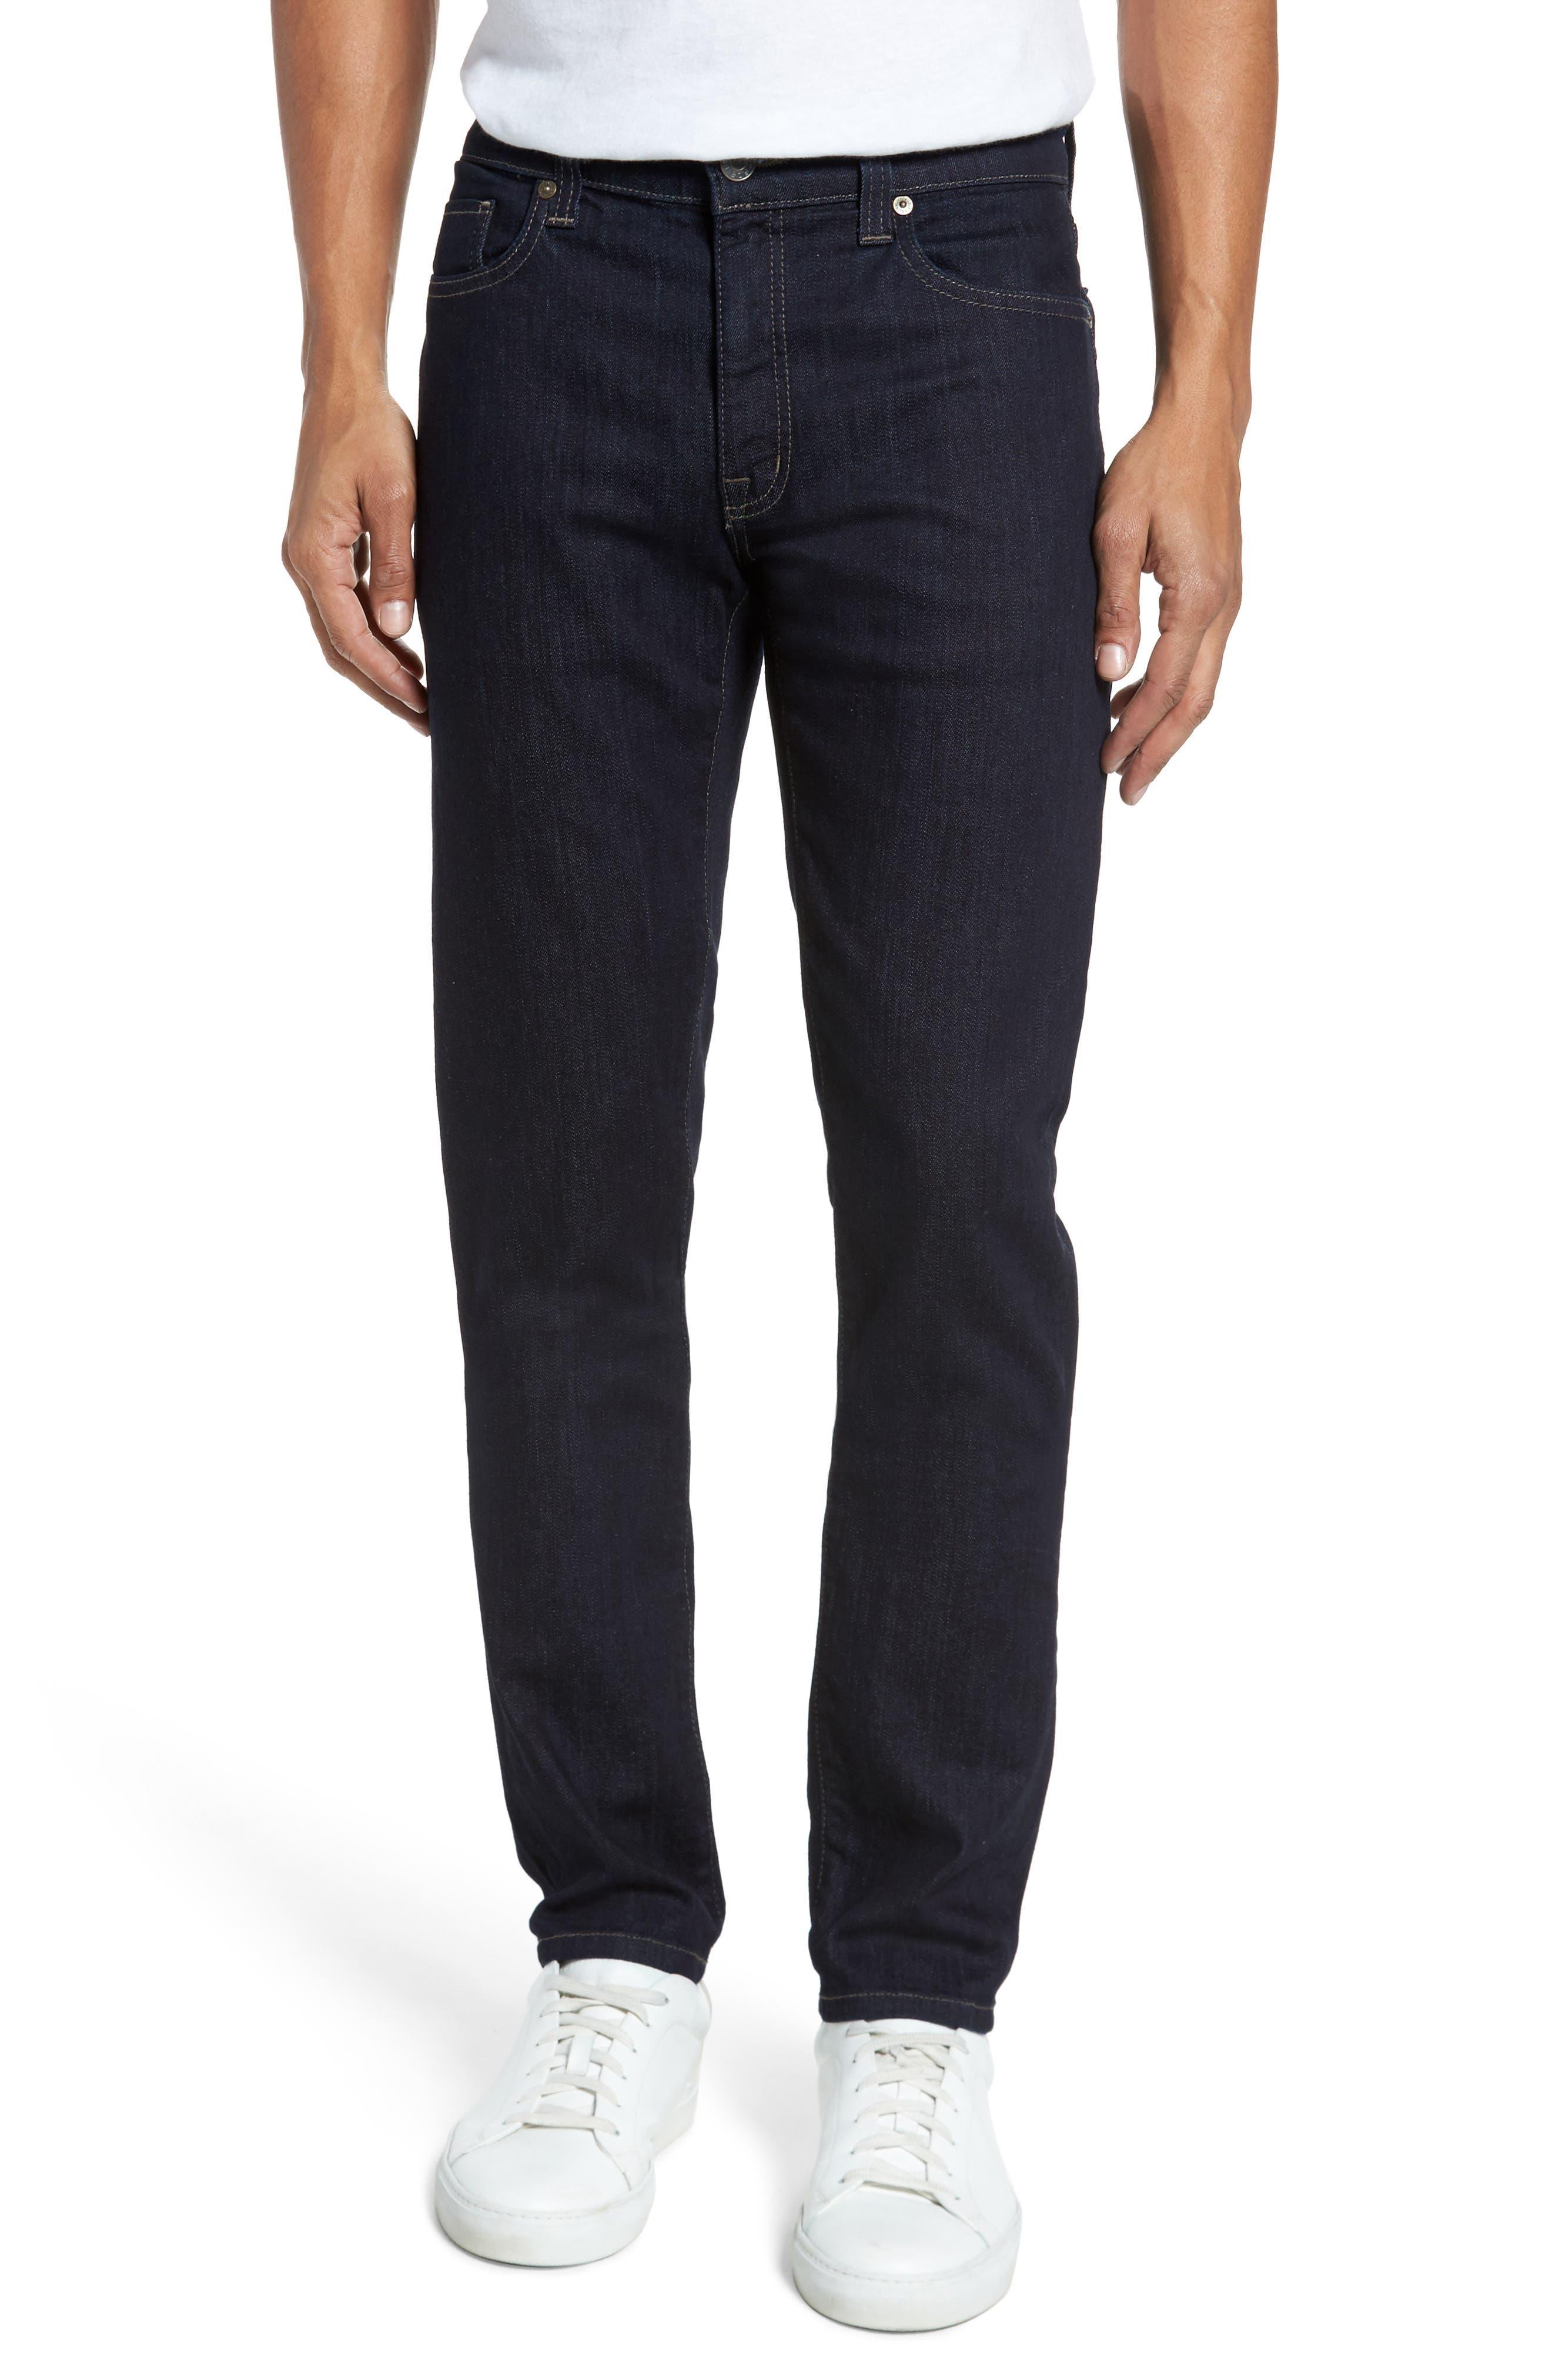 Alternate Image 1 Selected - Fidelity Denim Slim Fit Jeans (Galaxy)